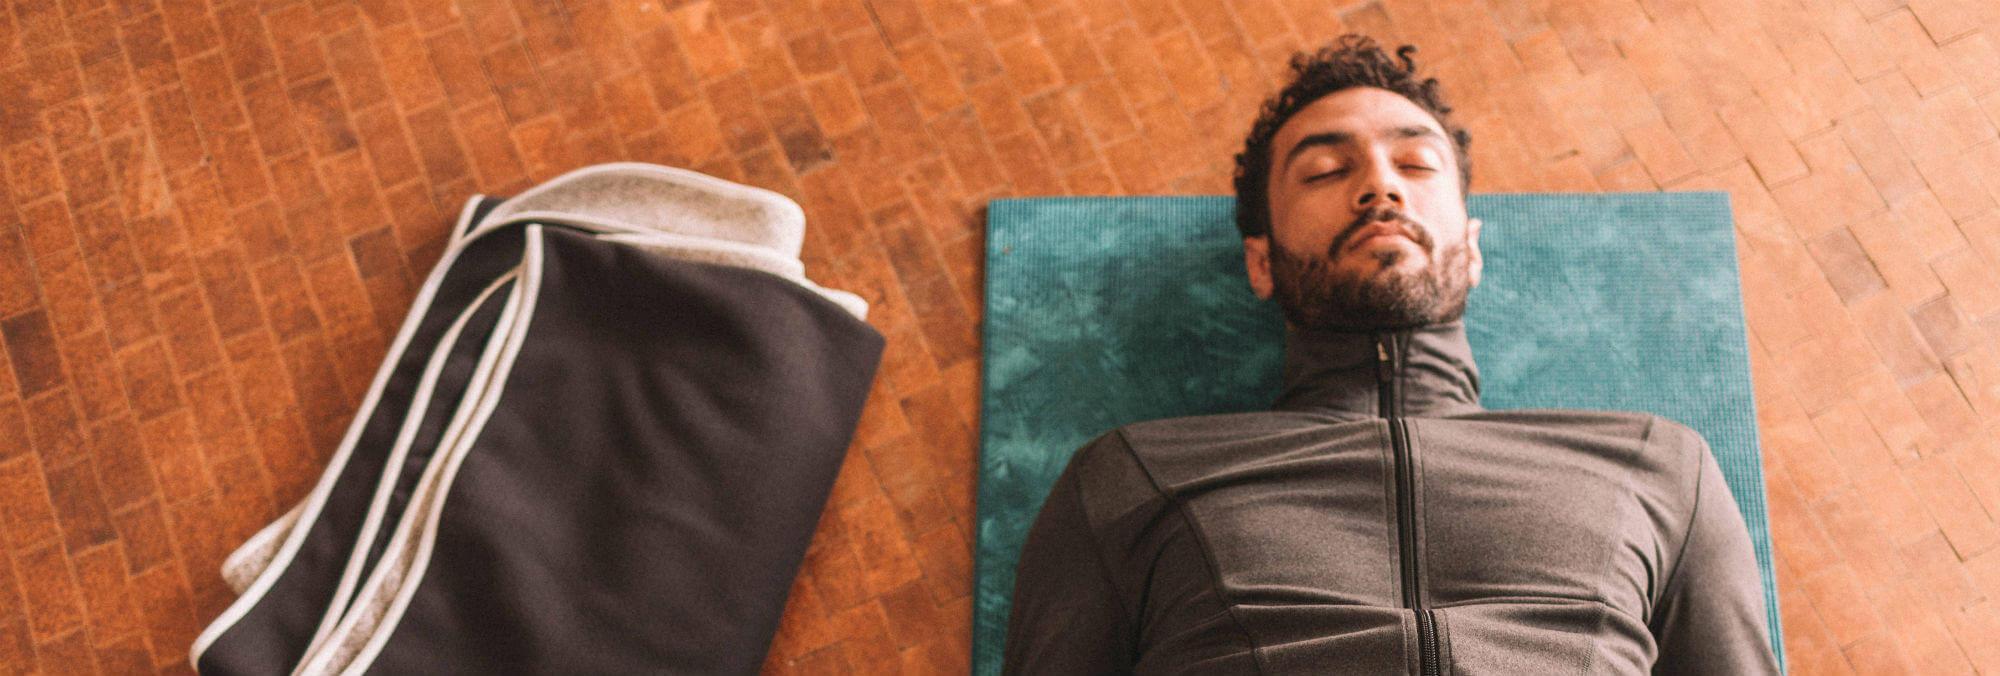 SLEEP: ESSENTIAL FOR PHYSICAL ACTIVITY